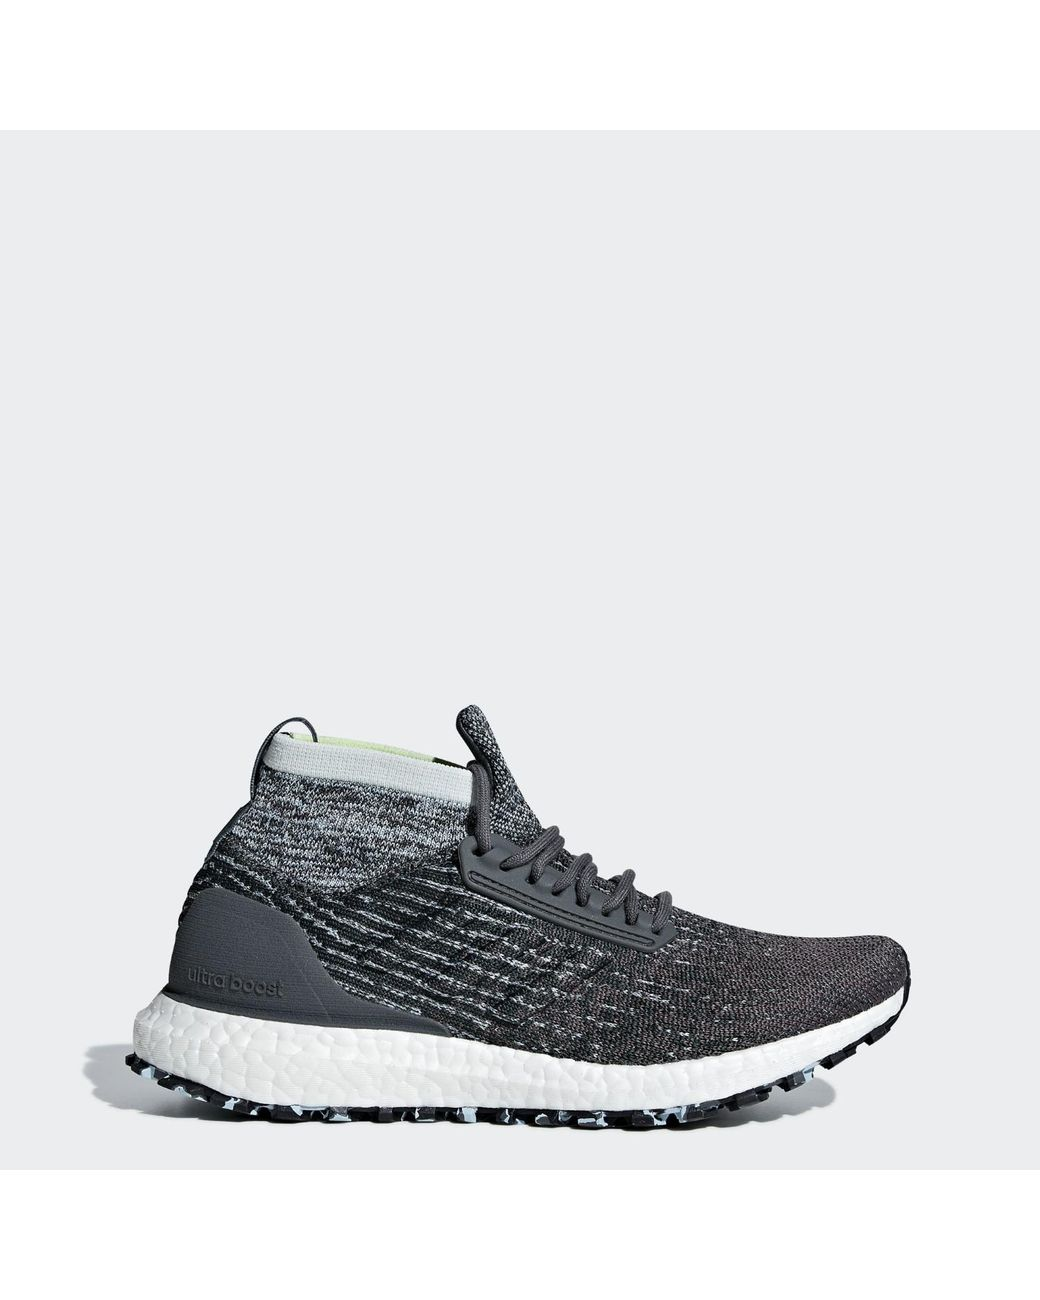 e9735d14e Lyst - adidas Ultraboost All Terrain Shoes in Gray